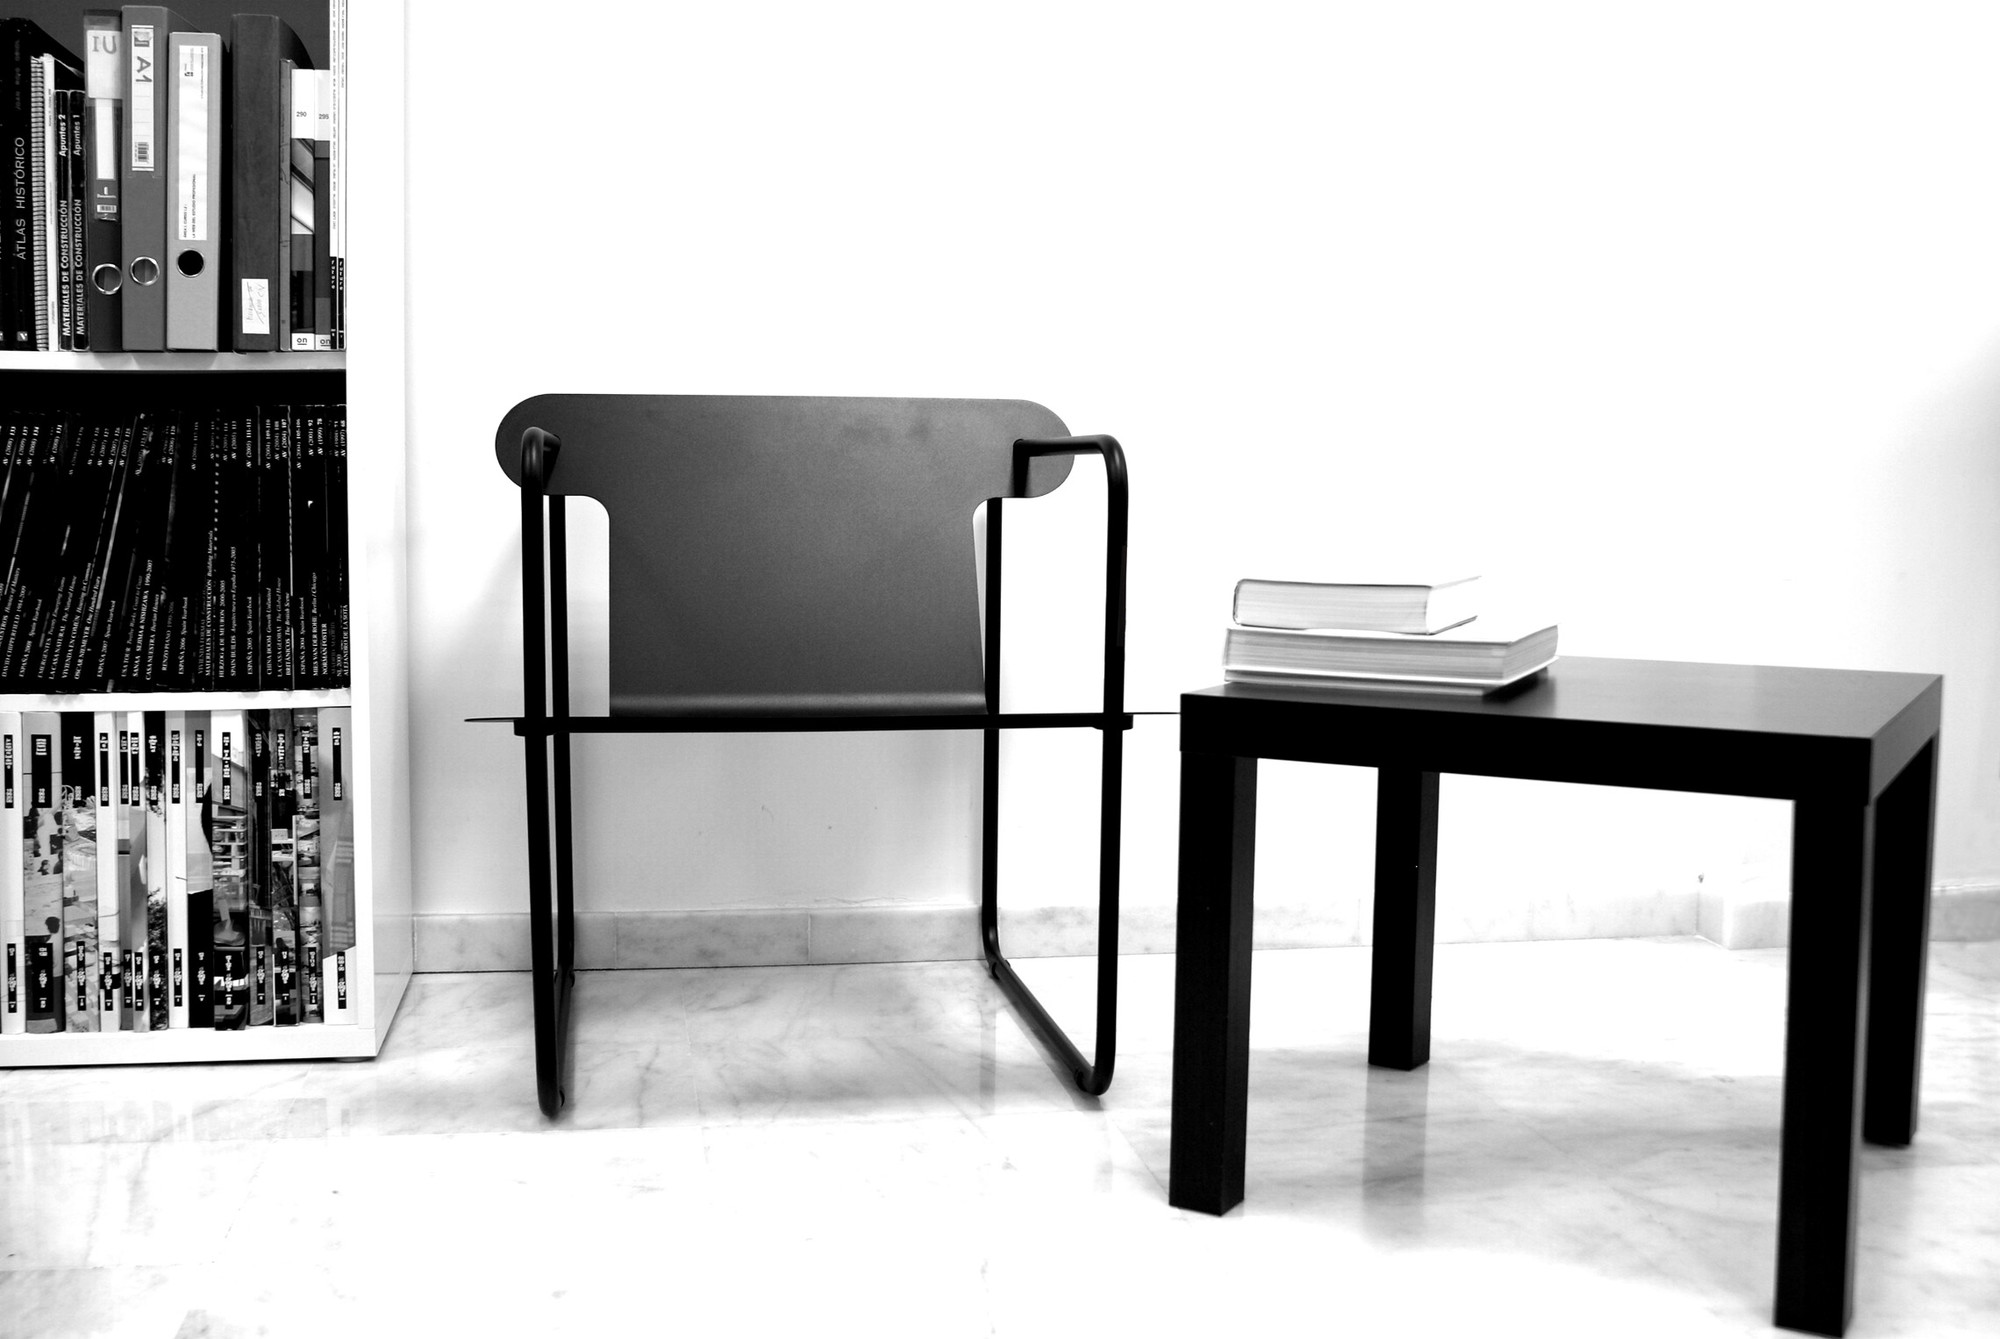 Silla Toad / Ignacio Hornillos Design Studio, Courtesy of Ignacio Hornillos